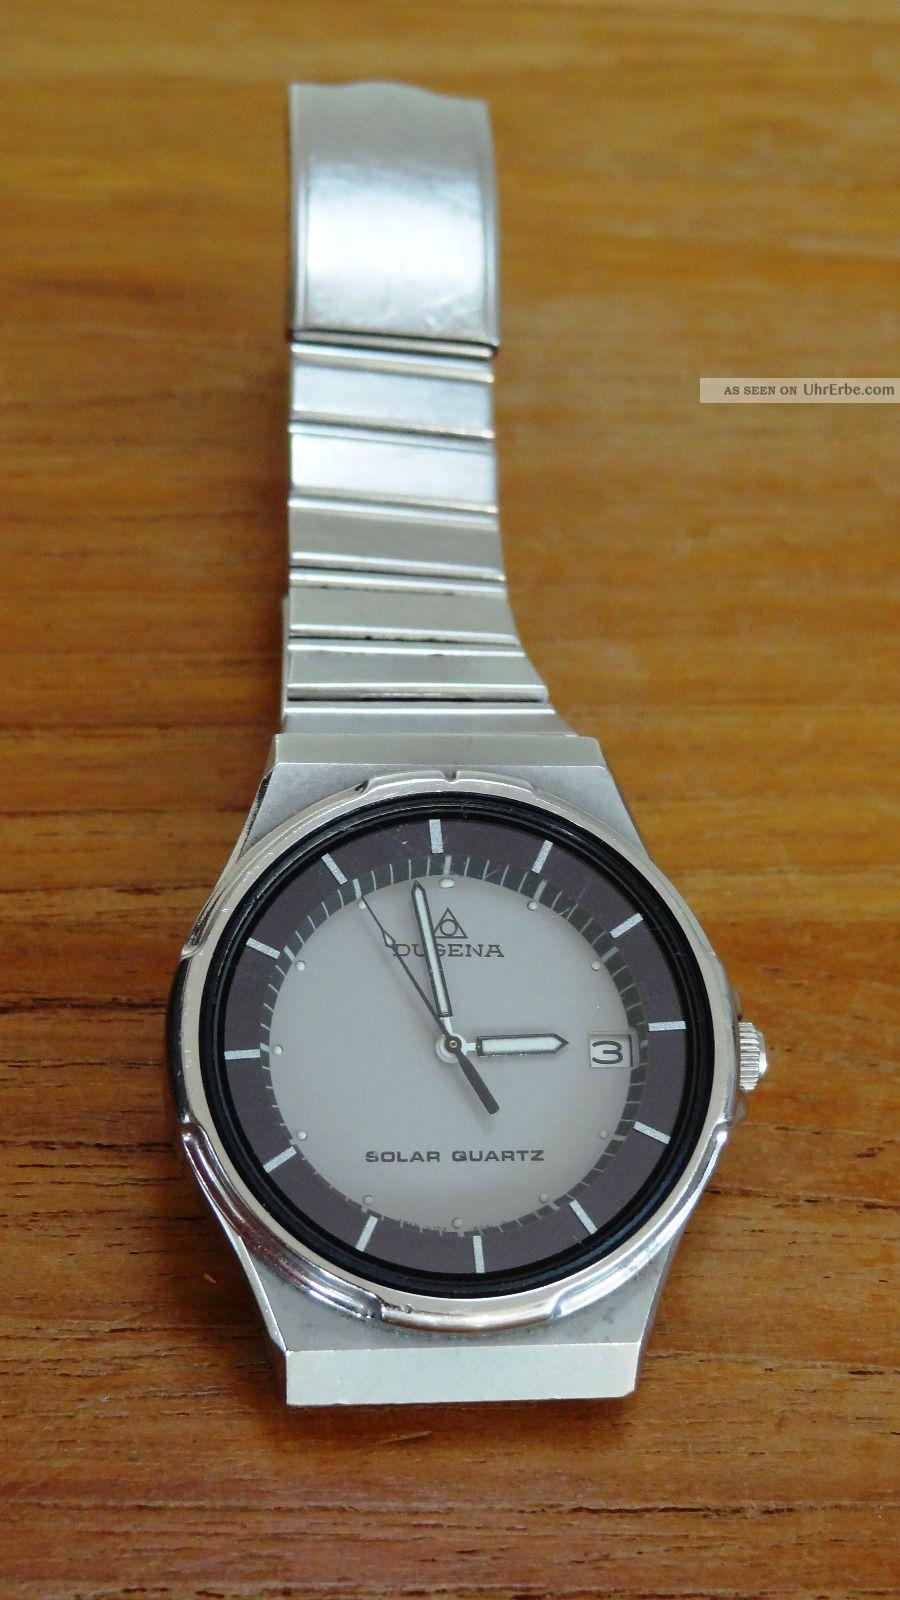 Dugena Herrenuhr Solar Quartz Edelstahl,  Vintage Sammler,  Von Privat Armbanduhren Bild